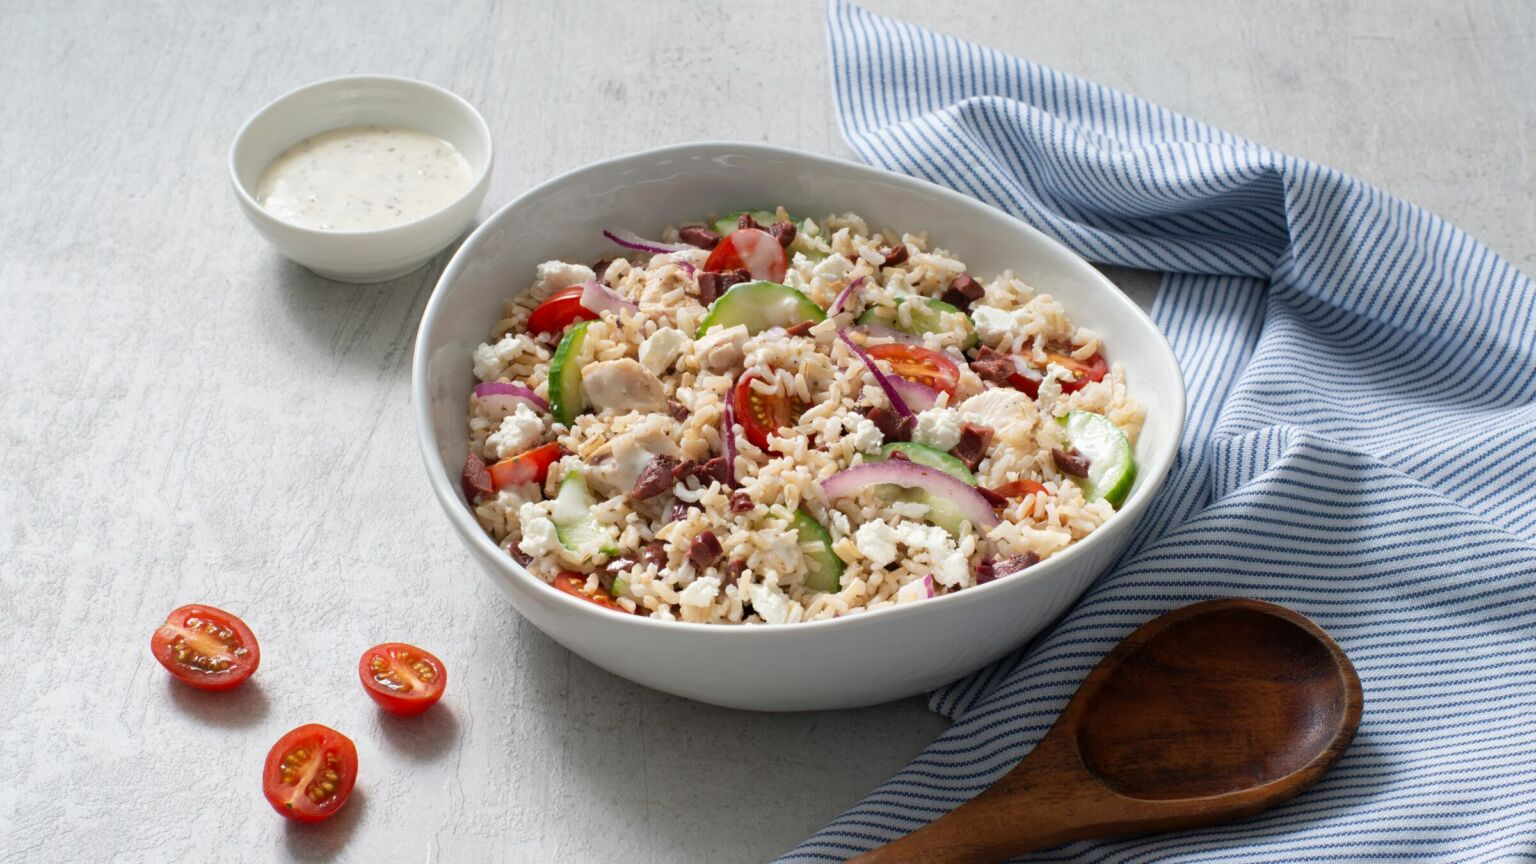 Greek Chicken and Rice Salad